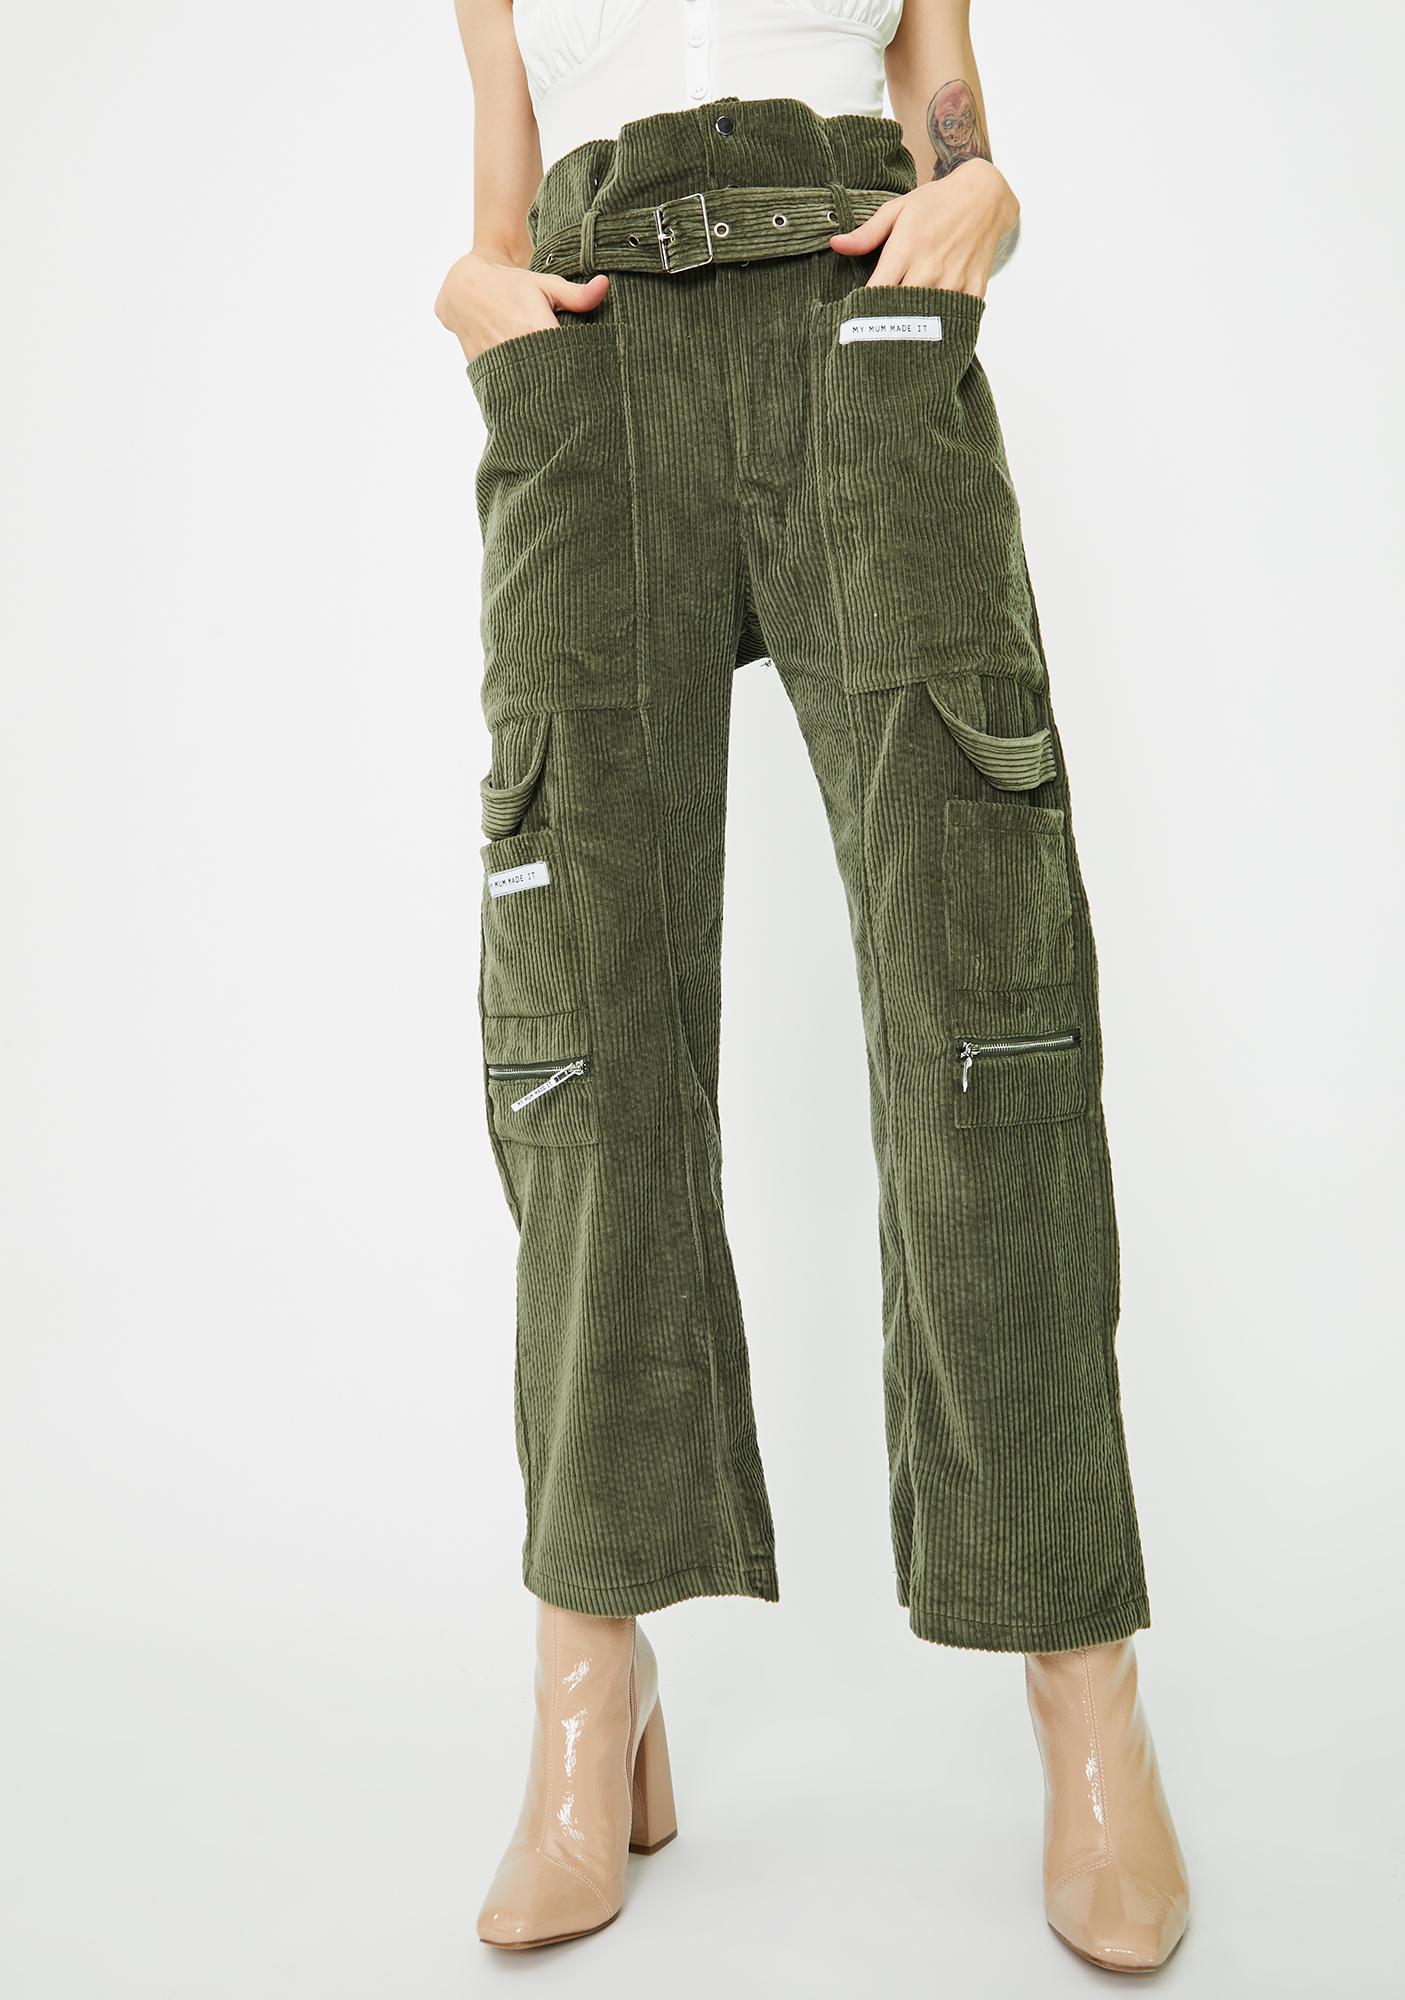 My Mum Made It Corduroy Functional Pants